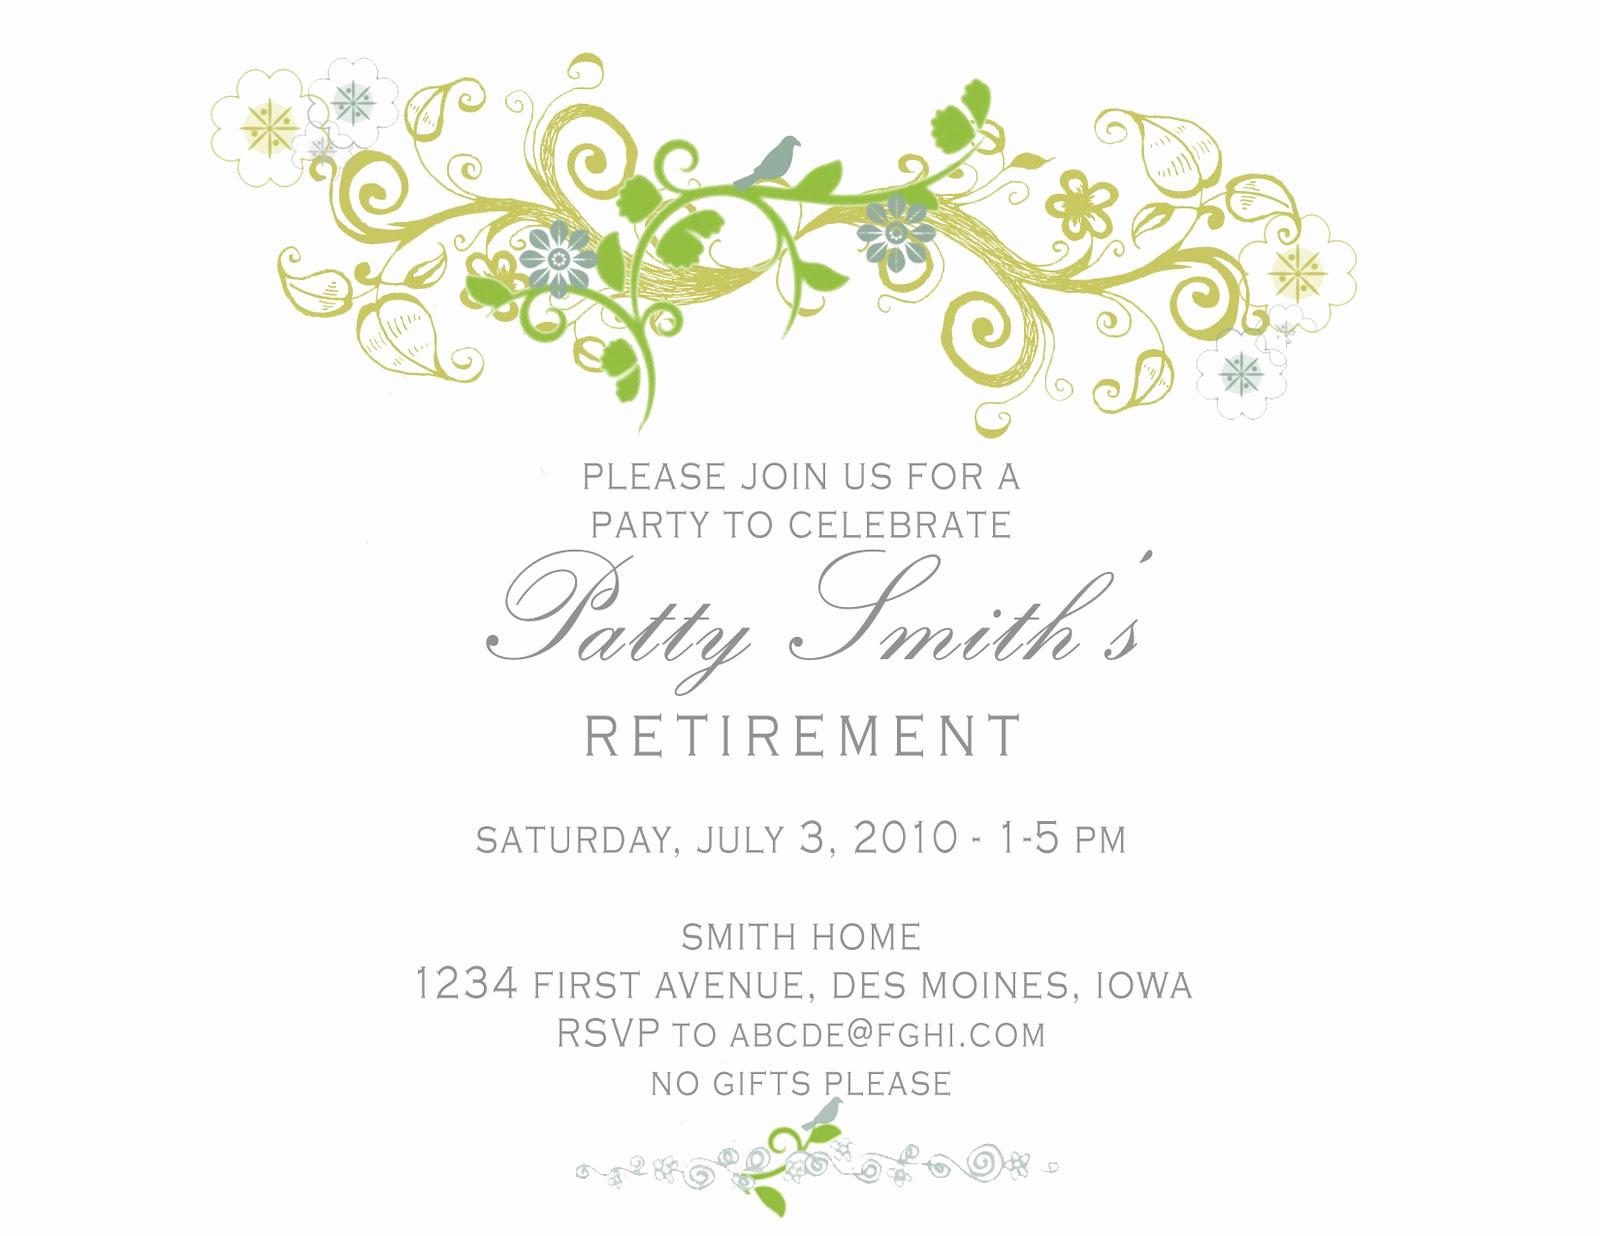 Retirement Invitation Template Free Inspirational Idesign A Retirement Party Invitation